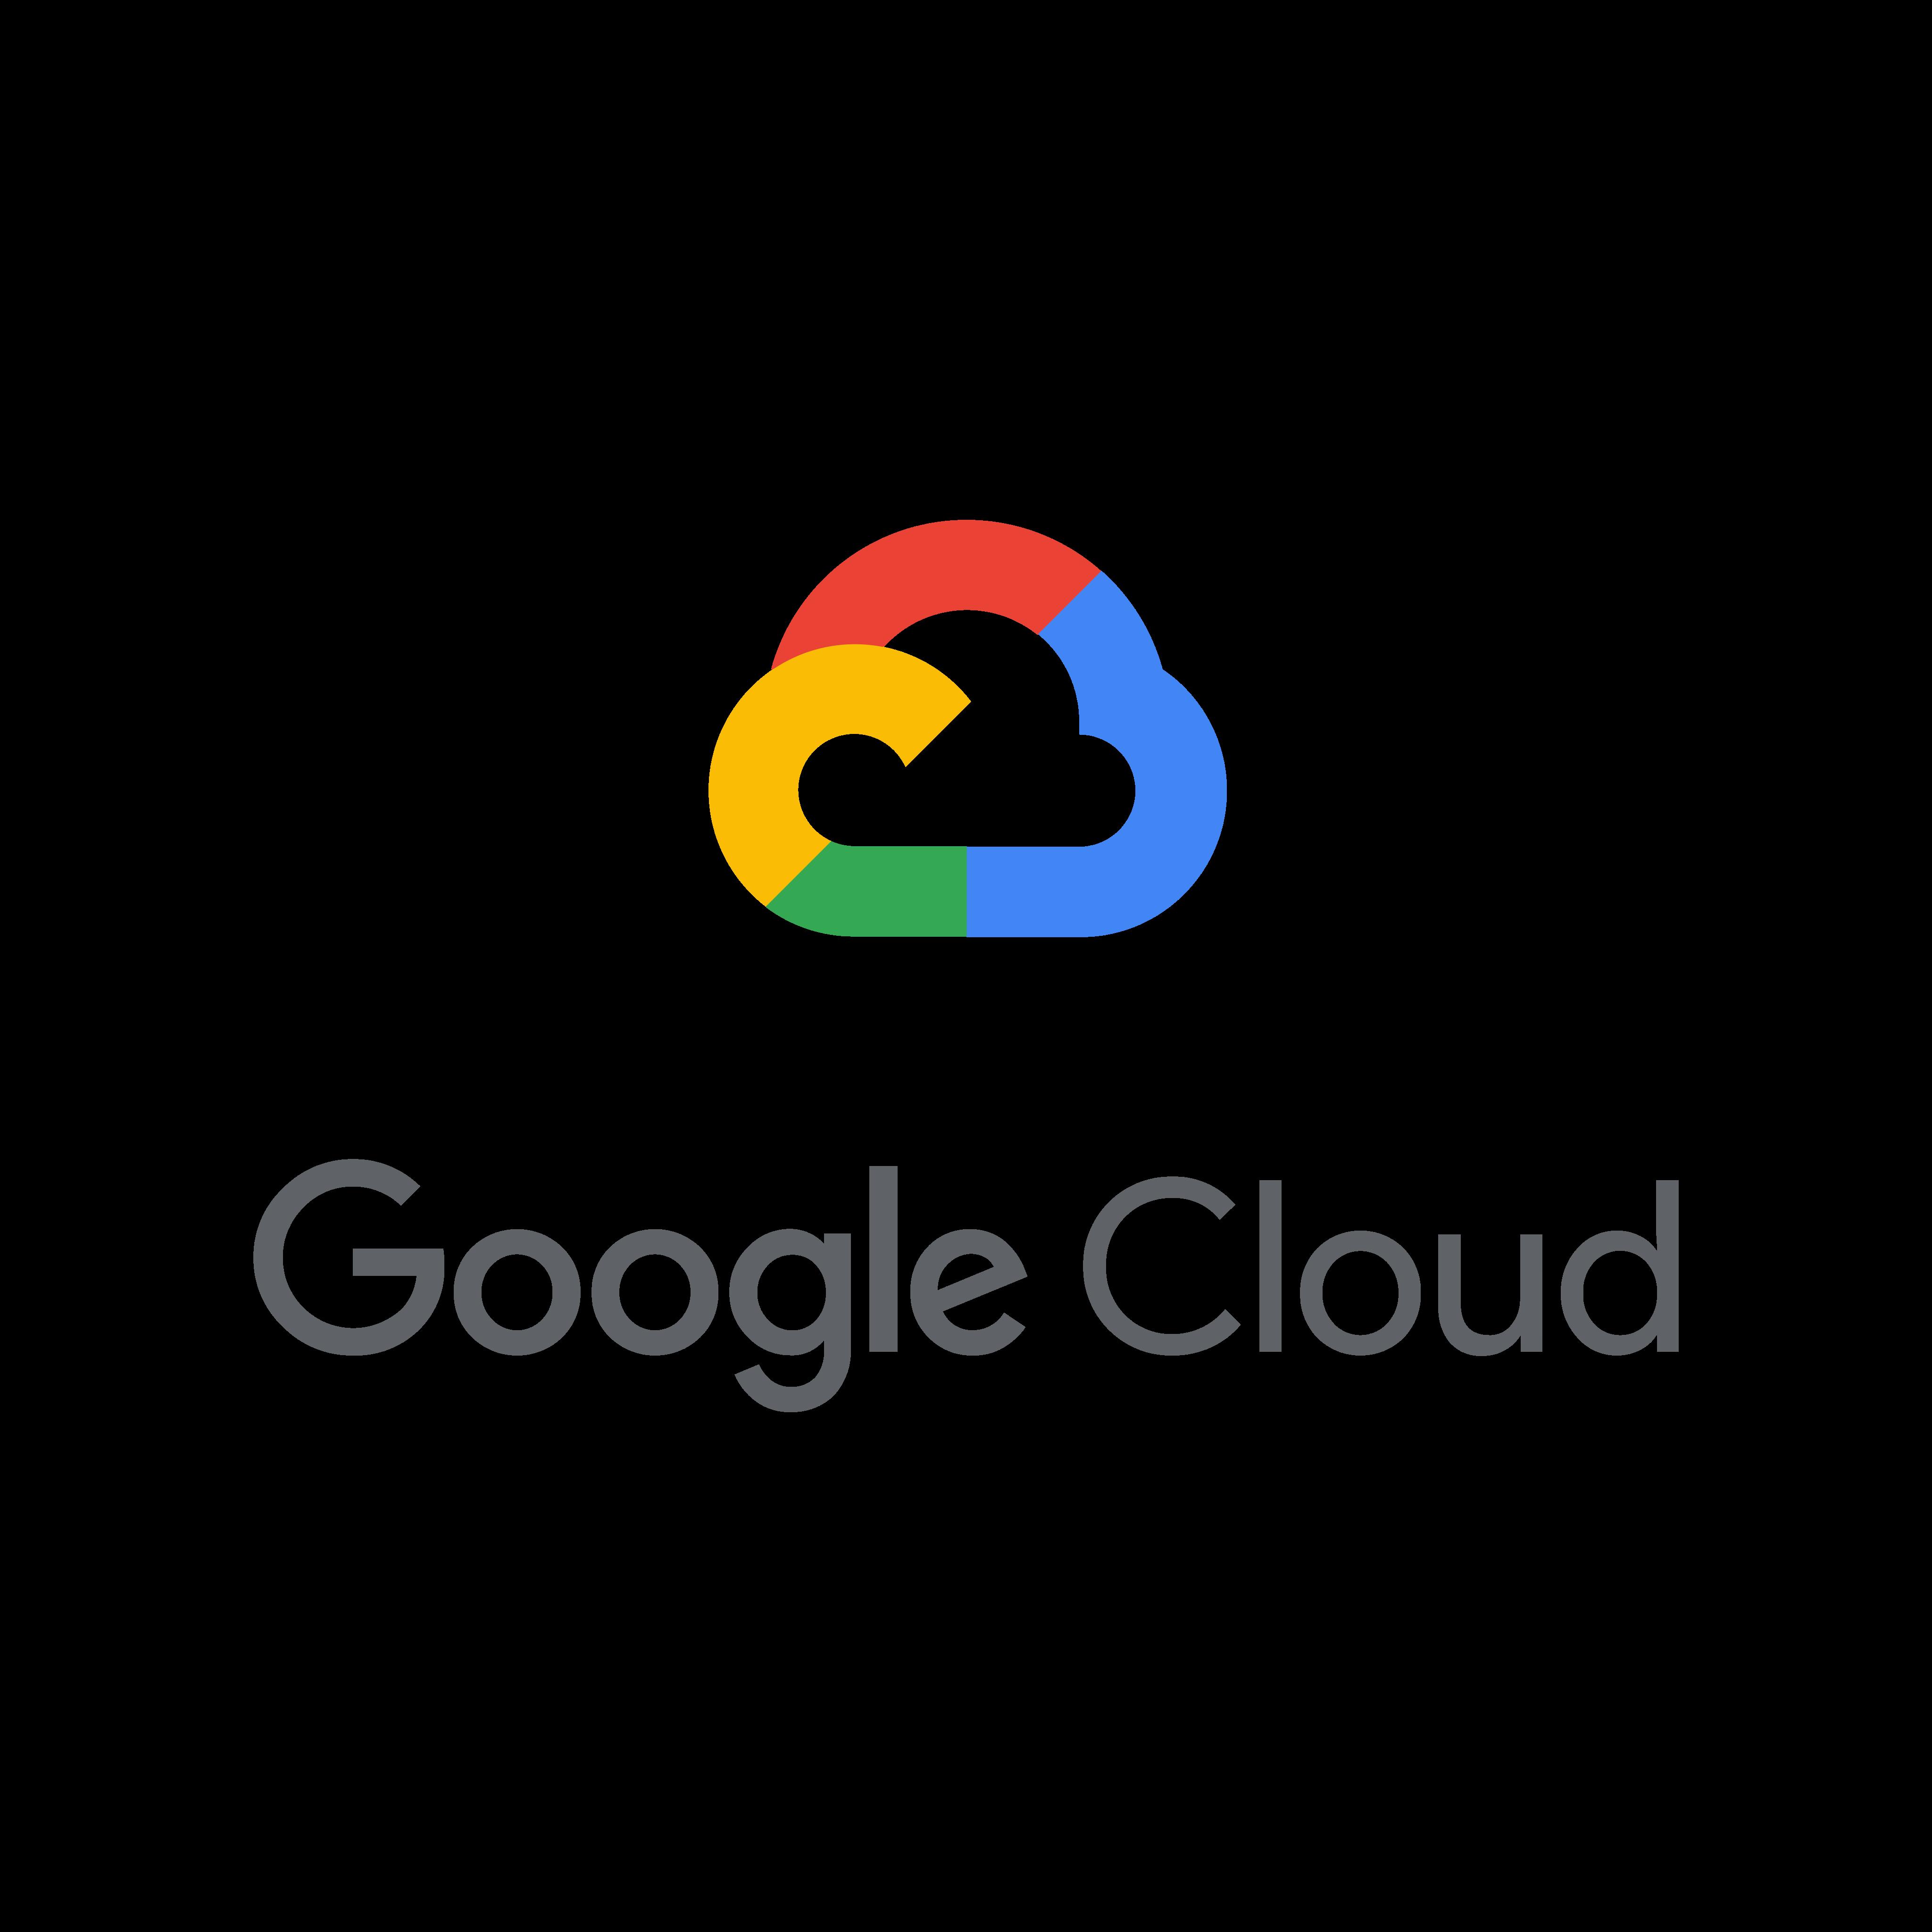 google cloud logo 0 - Google Cloud Logo